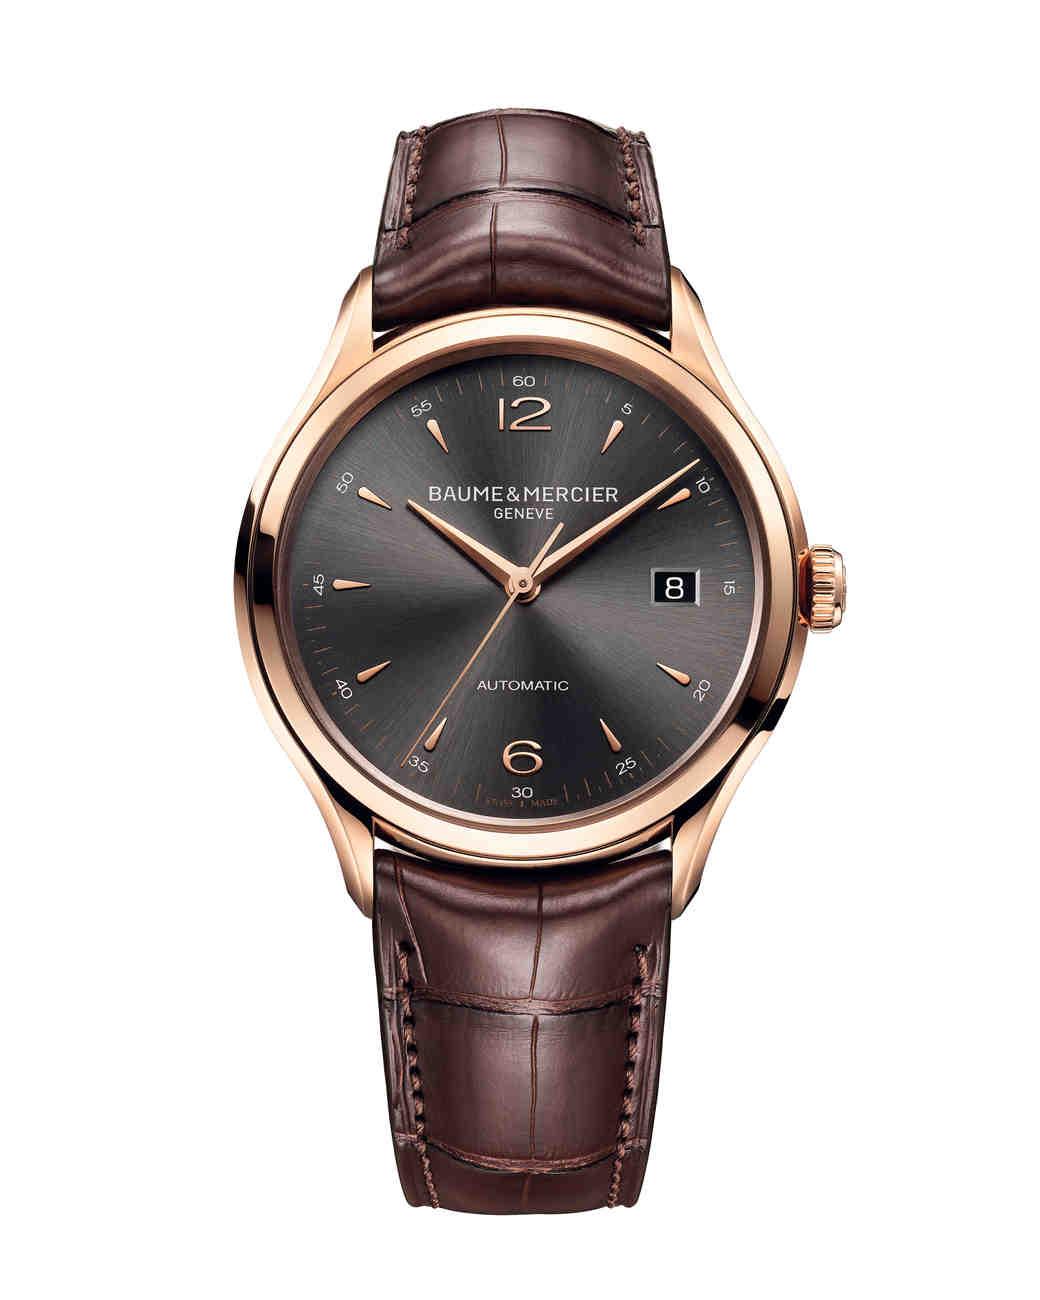 baume-mercier-watch-c0lifton-10059-0614.jpg